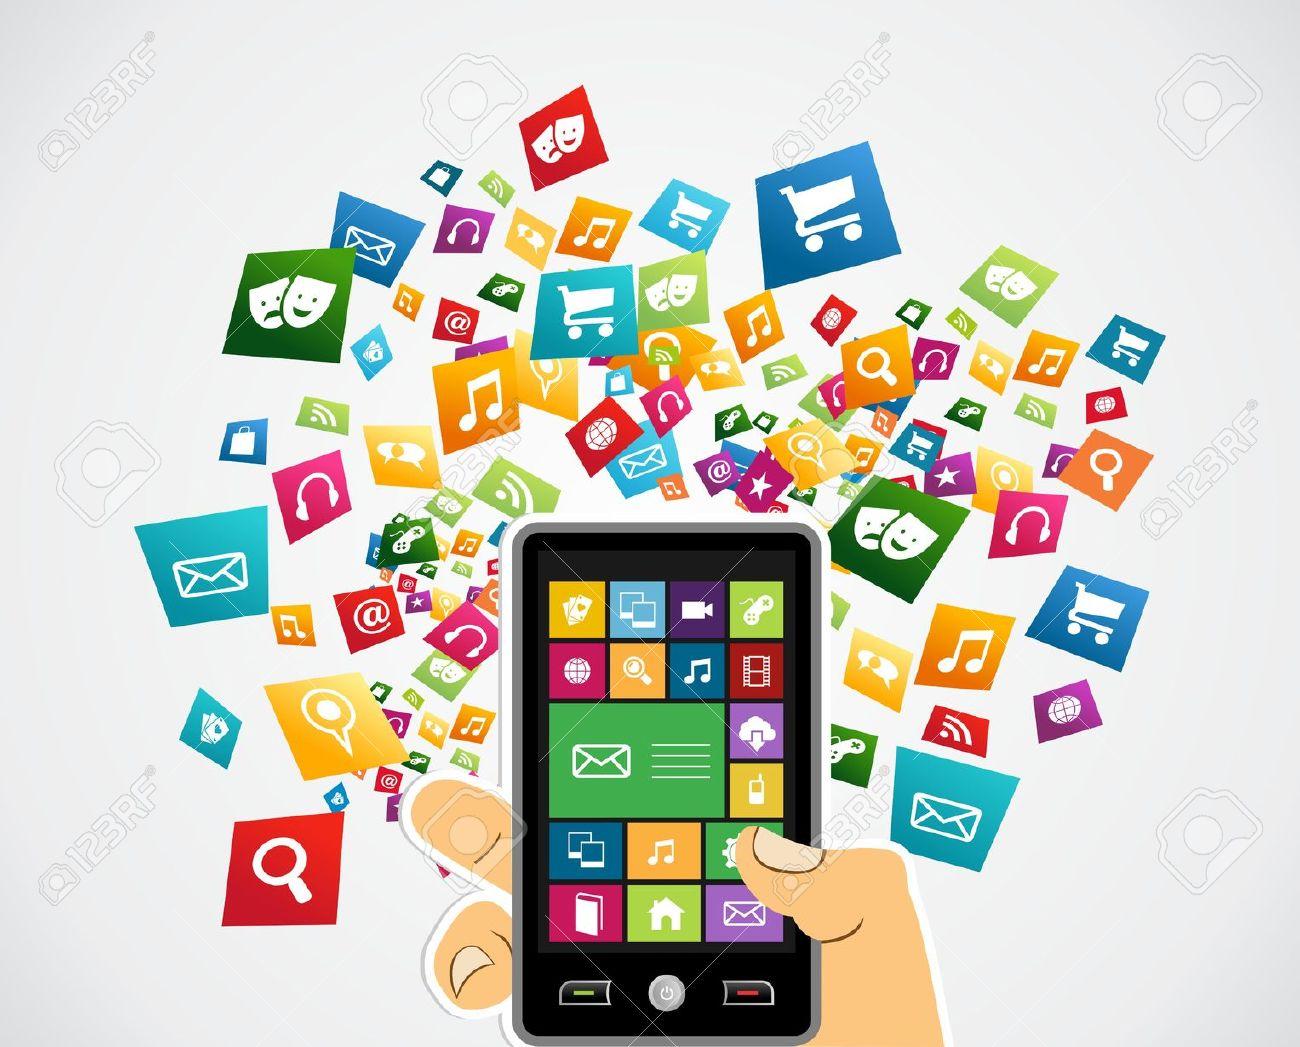 app-clipart-8.jpg